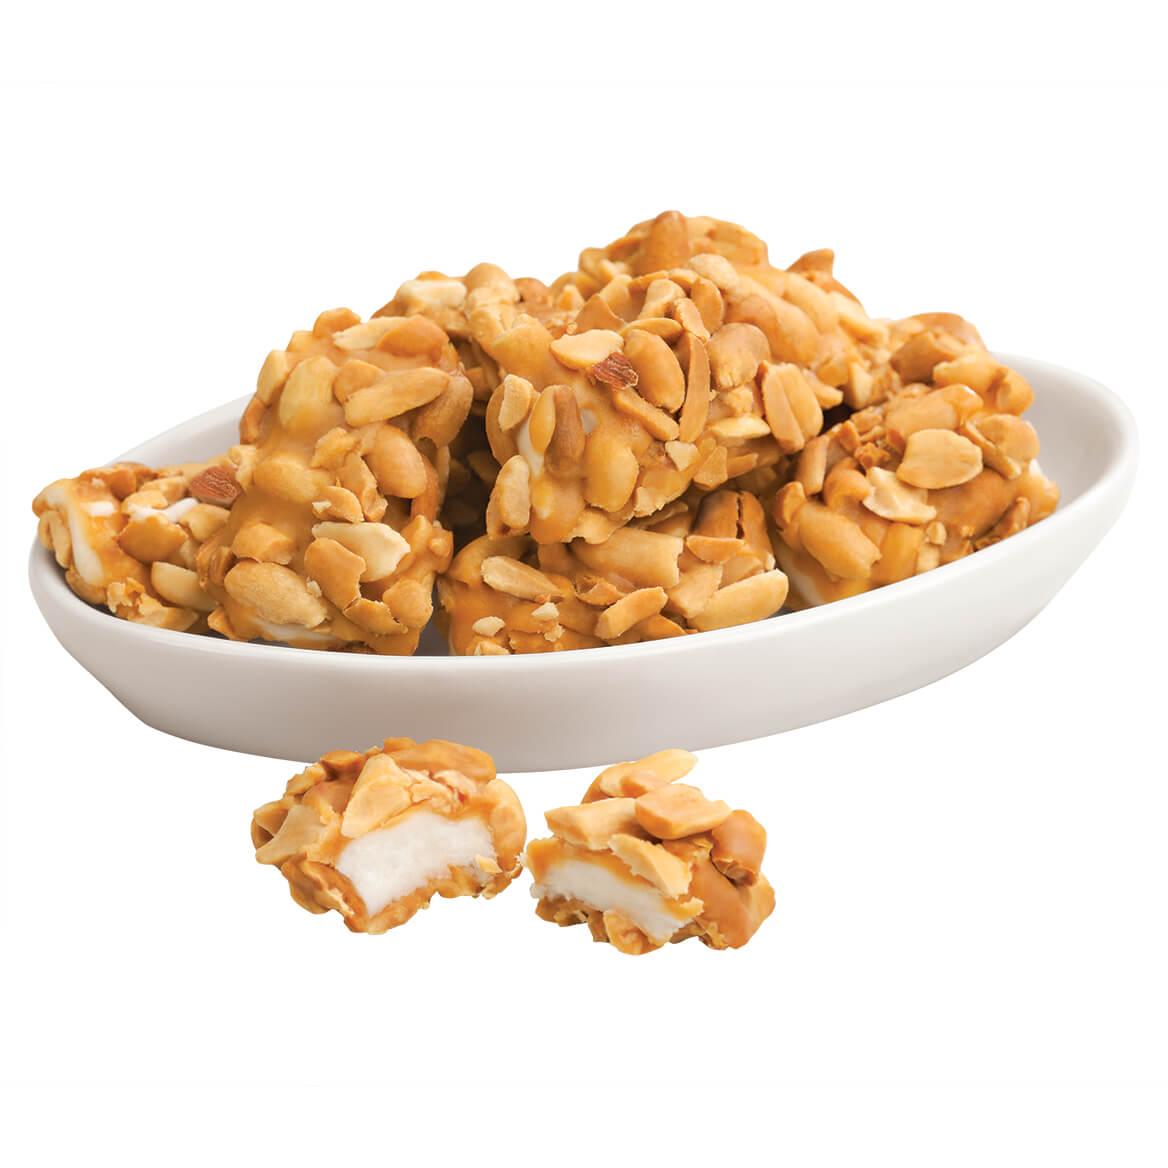 Pearson's Mini Nut Rolls, 8 oz.-363457